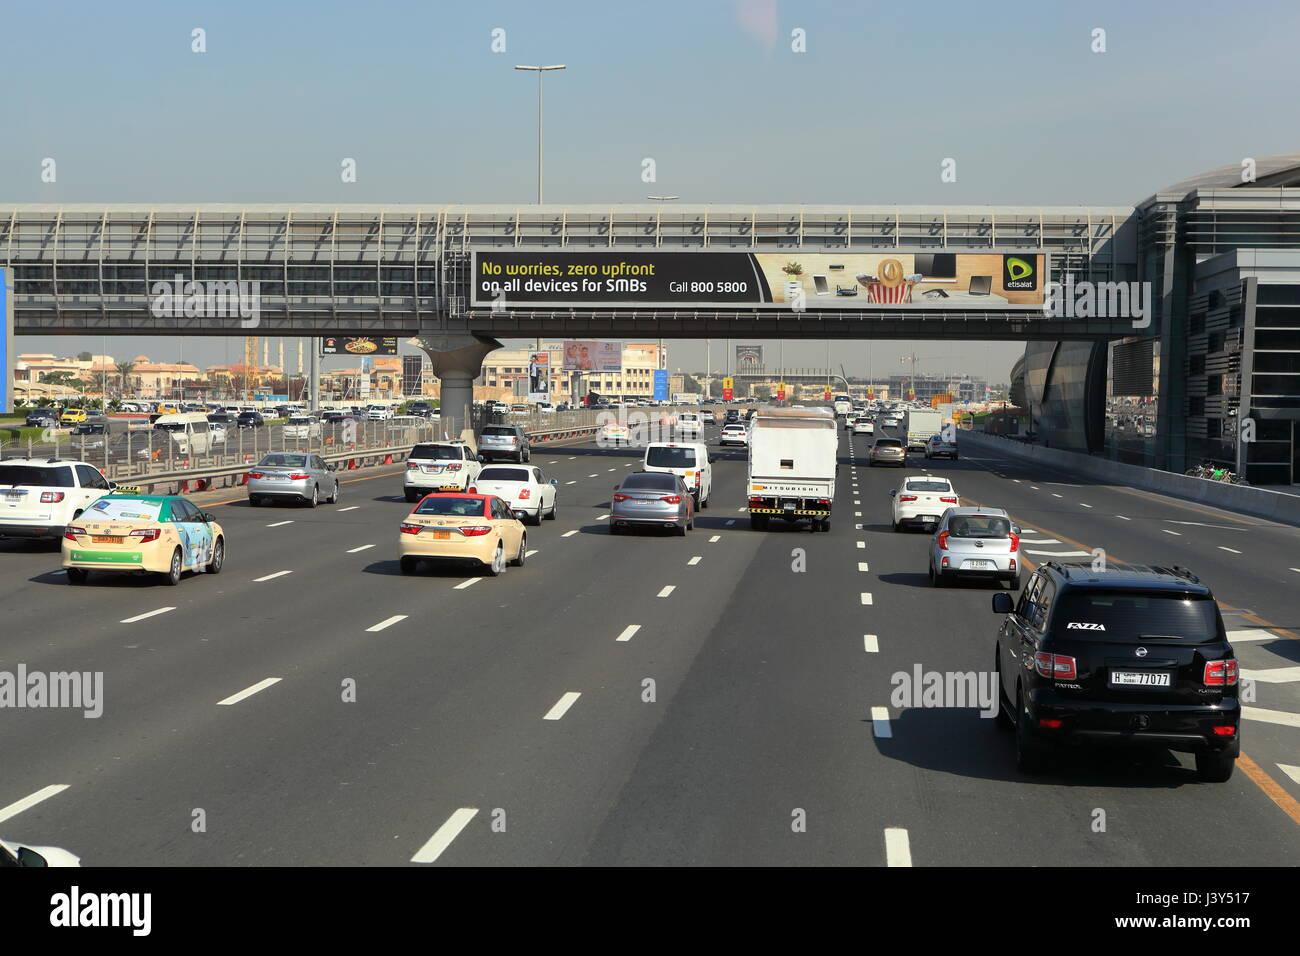 Traffic on the 12 lane highway in Dubai, United Arab